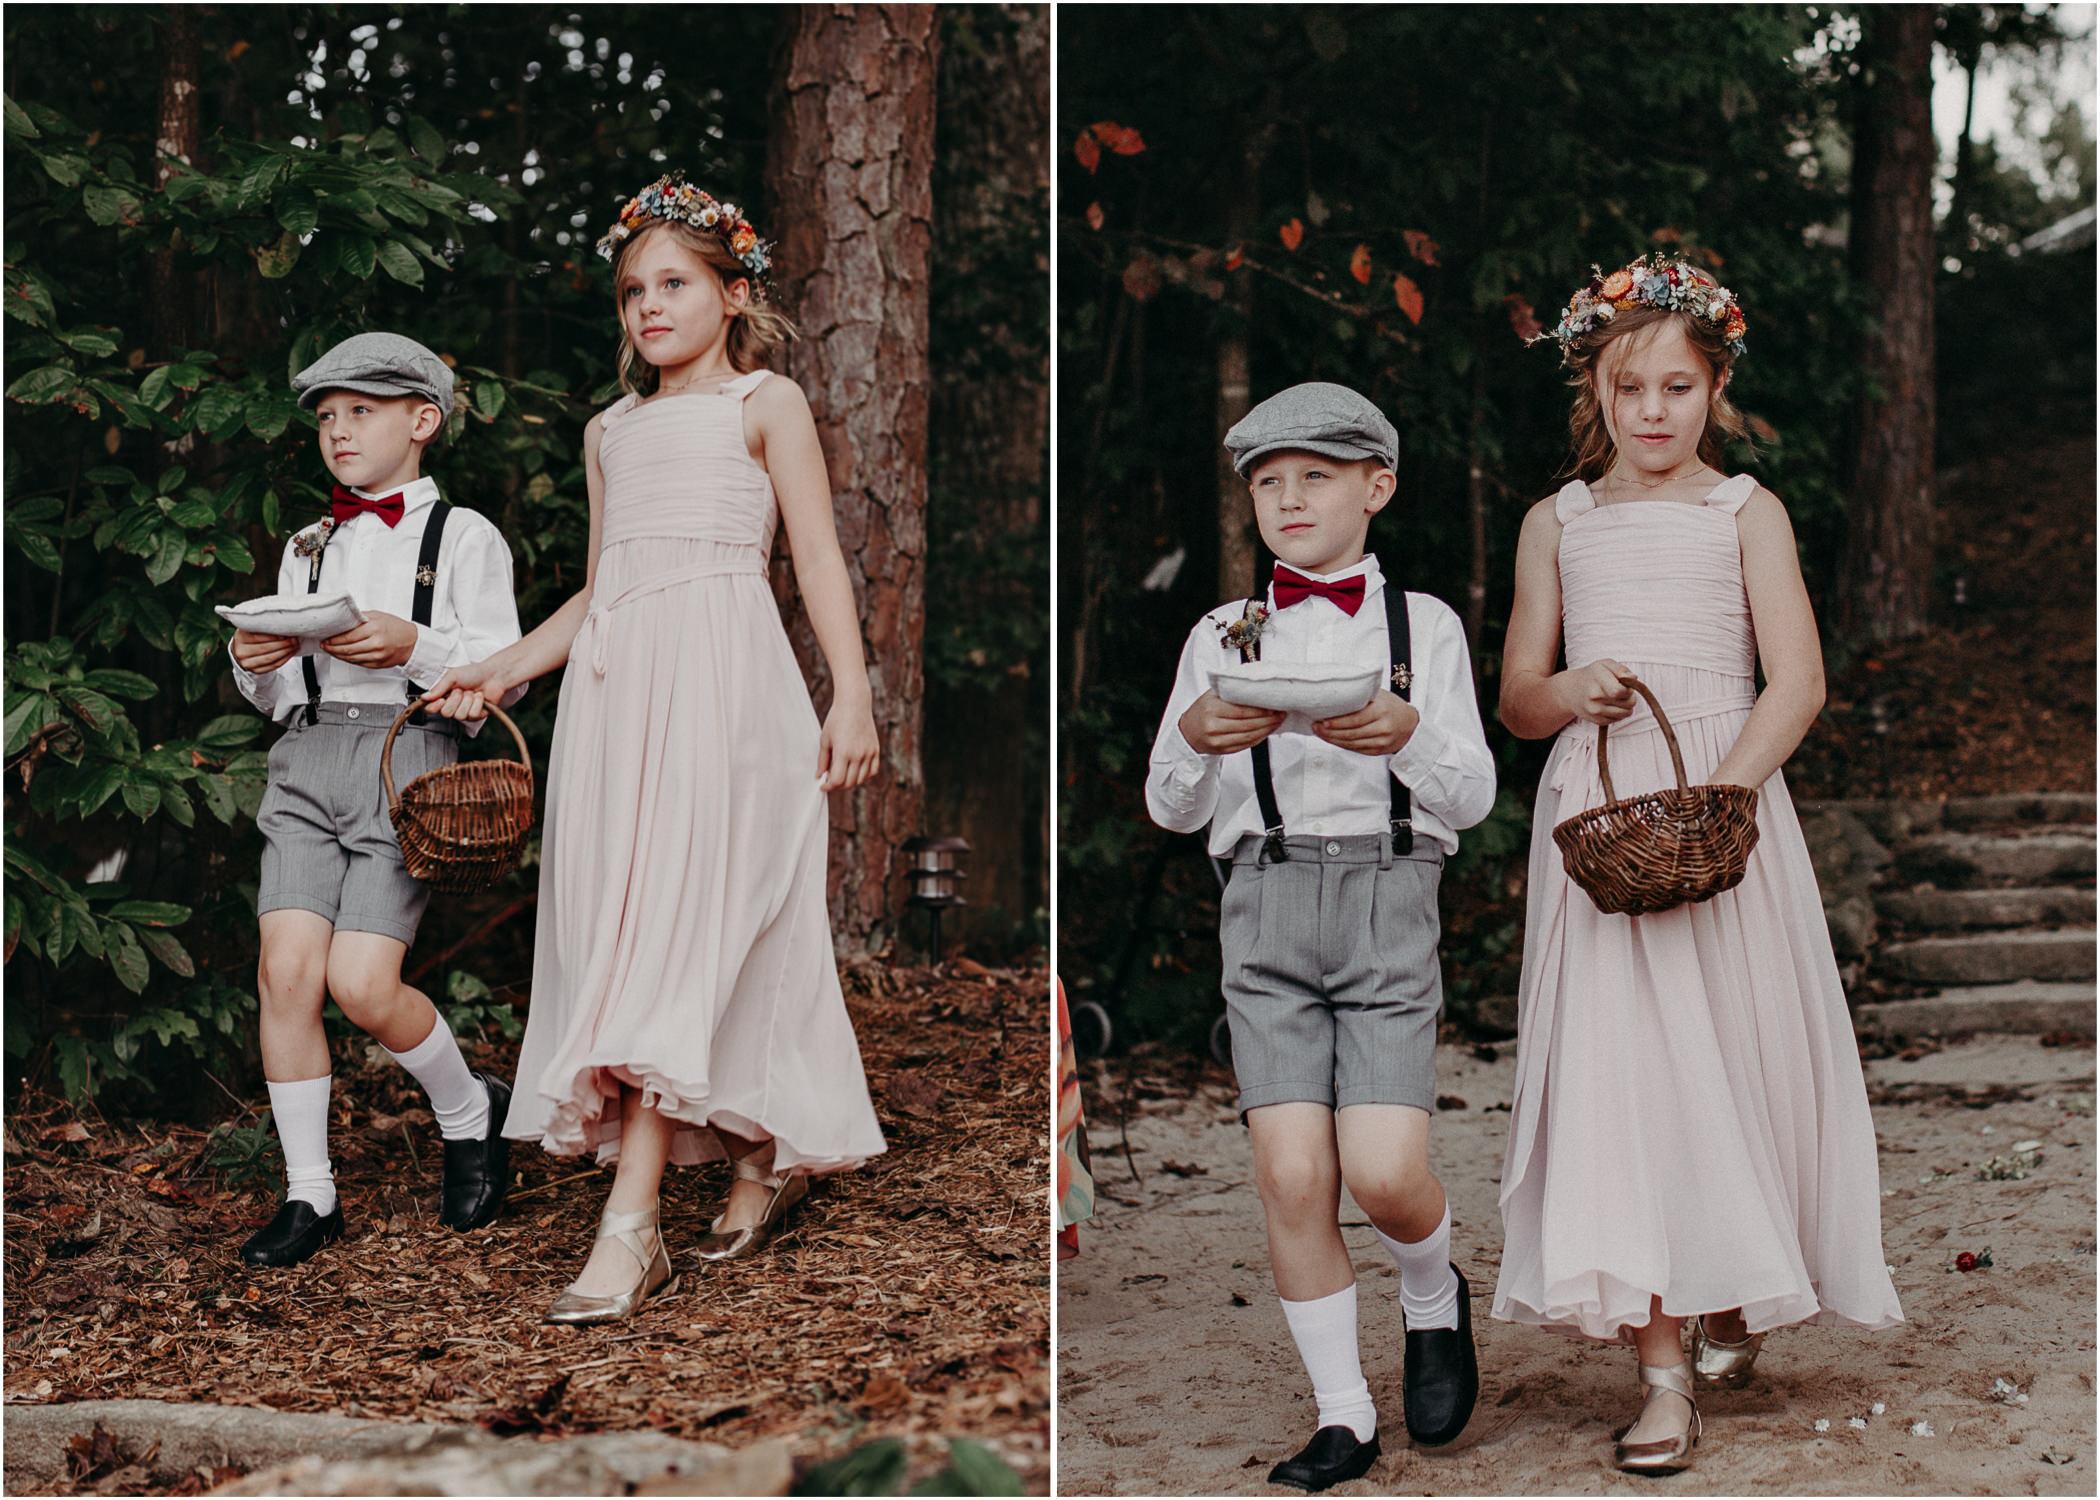 93 - Flower girl and ring bearer - Wedding Ceremony - Destination Wedding : Beach : Lake Wedding Atlanta Wedding Photographer .jpg